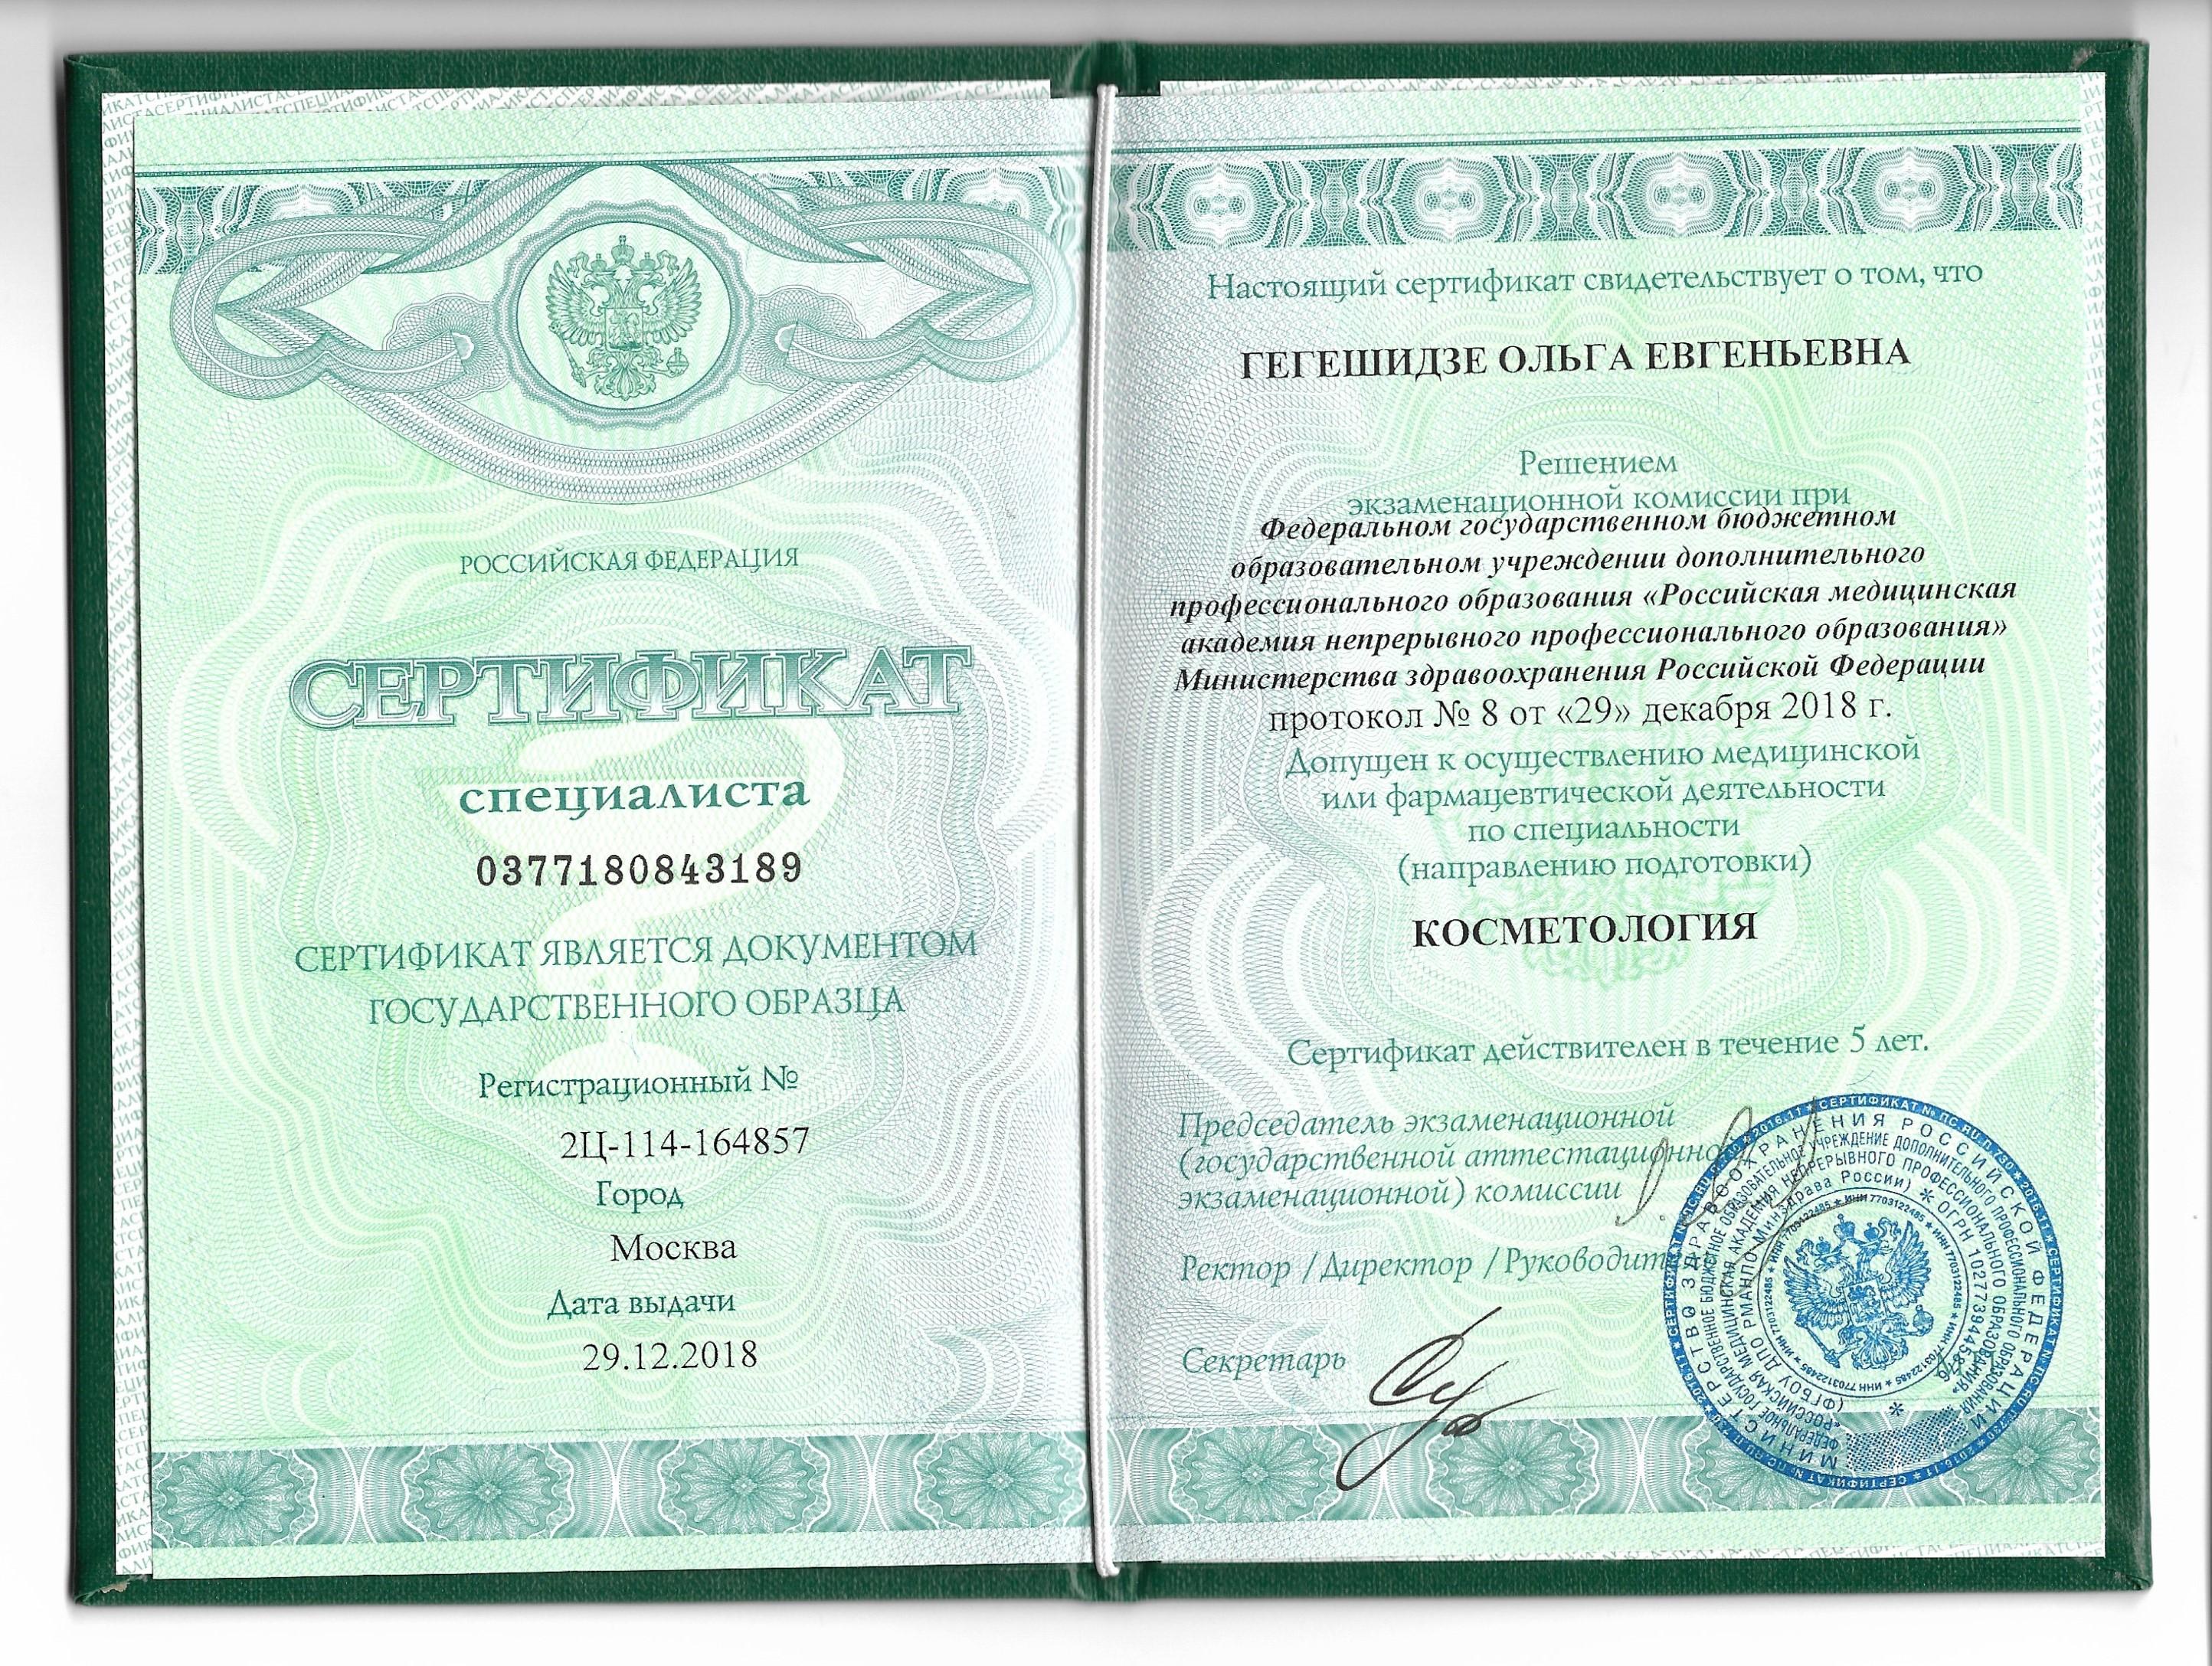 Кадзилова Ольга Евгеньевна